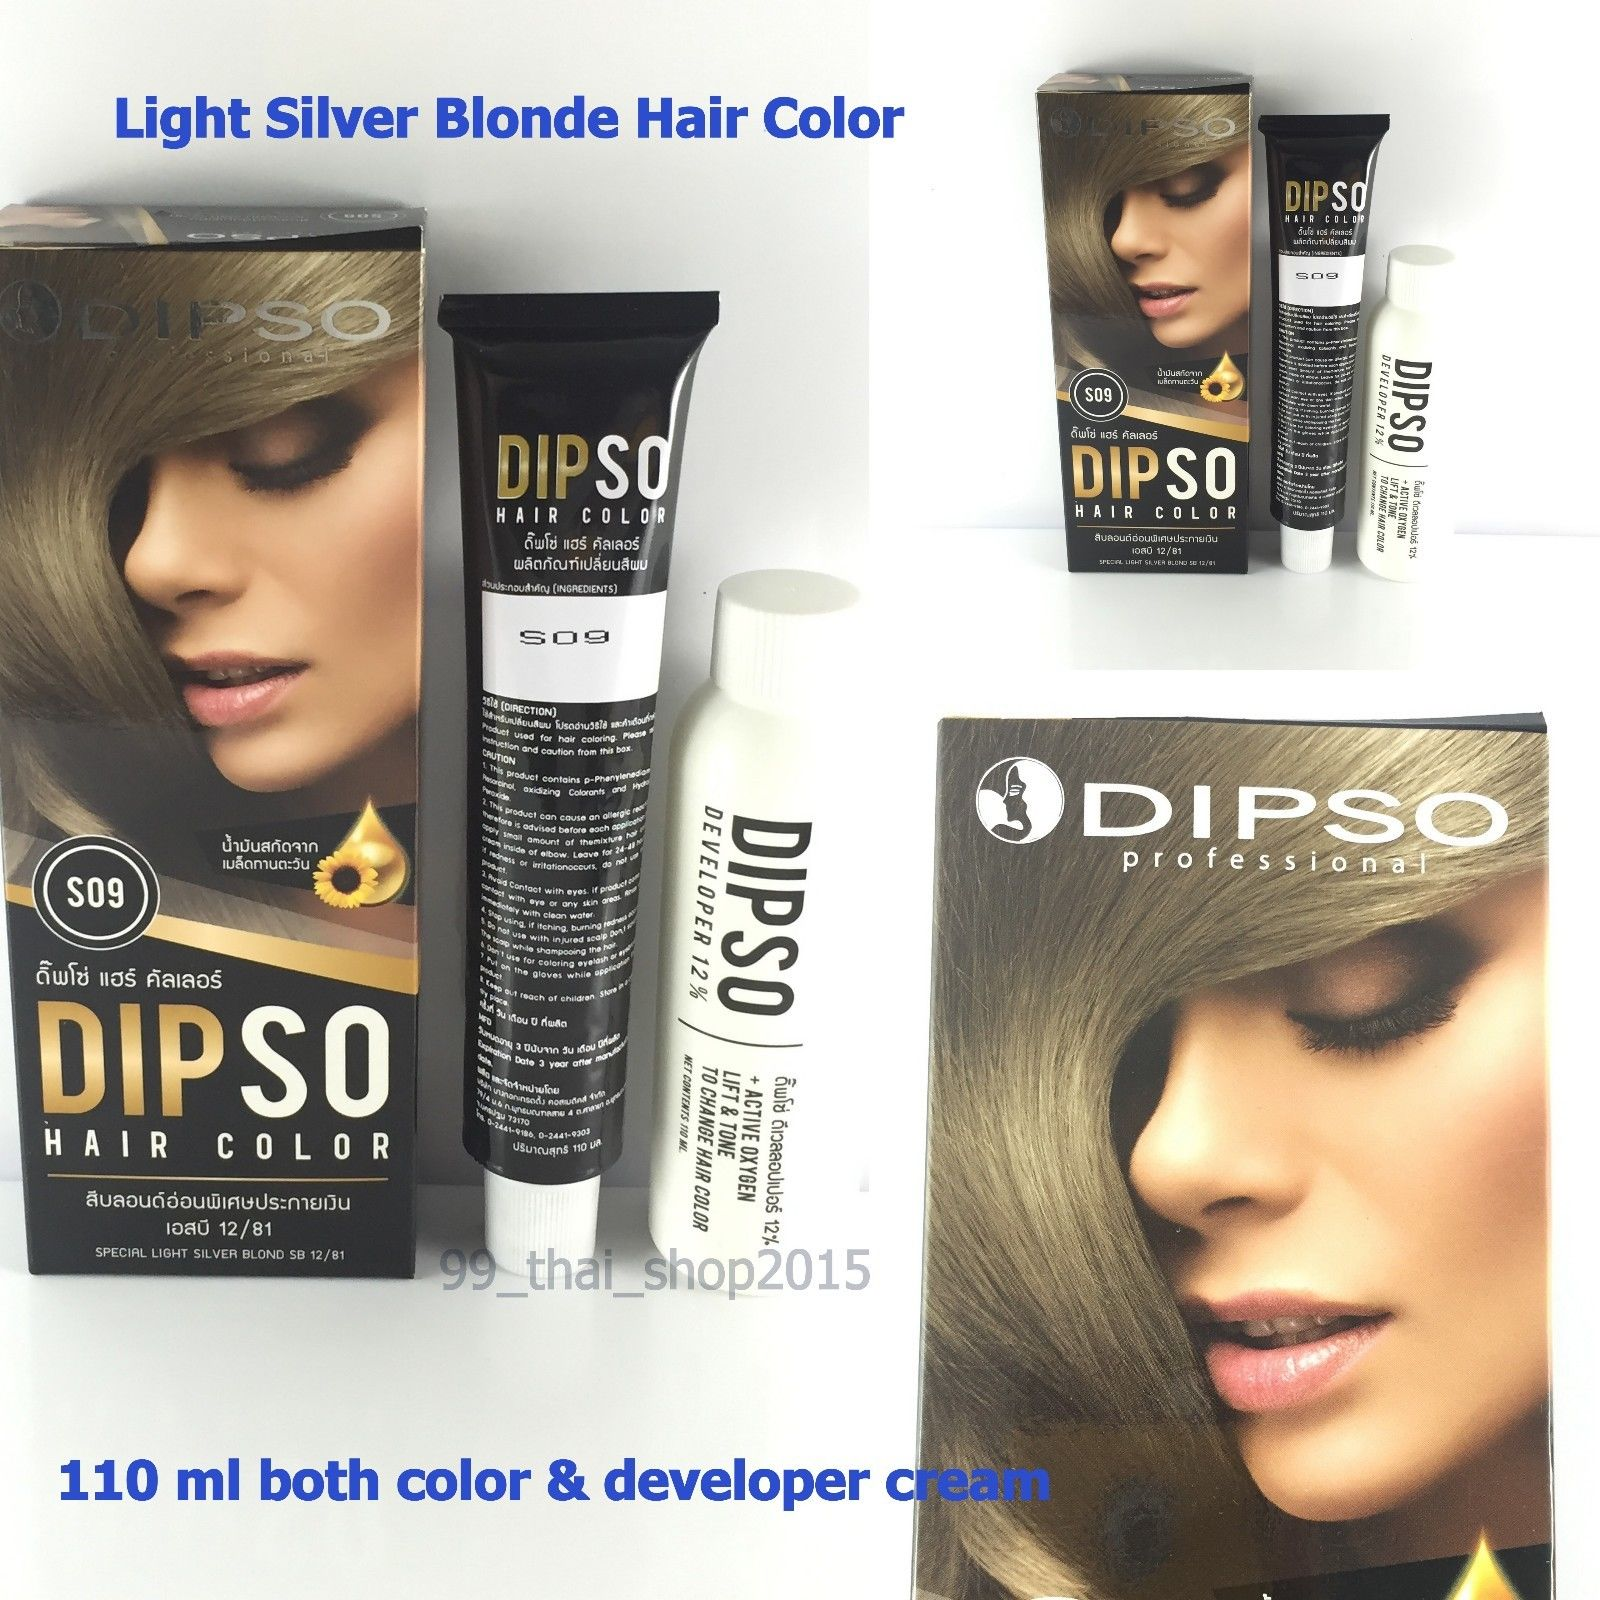 DIPSO Permanent Hair Color Light Silver Blonde 110 ml color cream & developer free ship